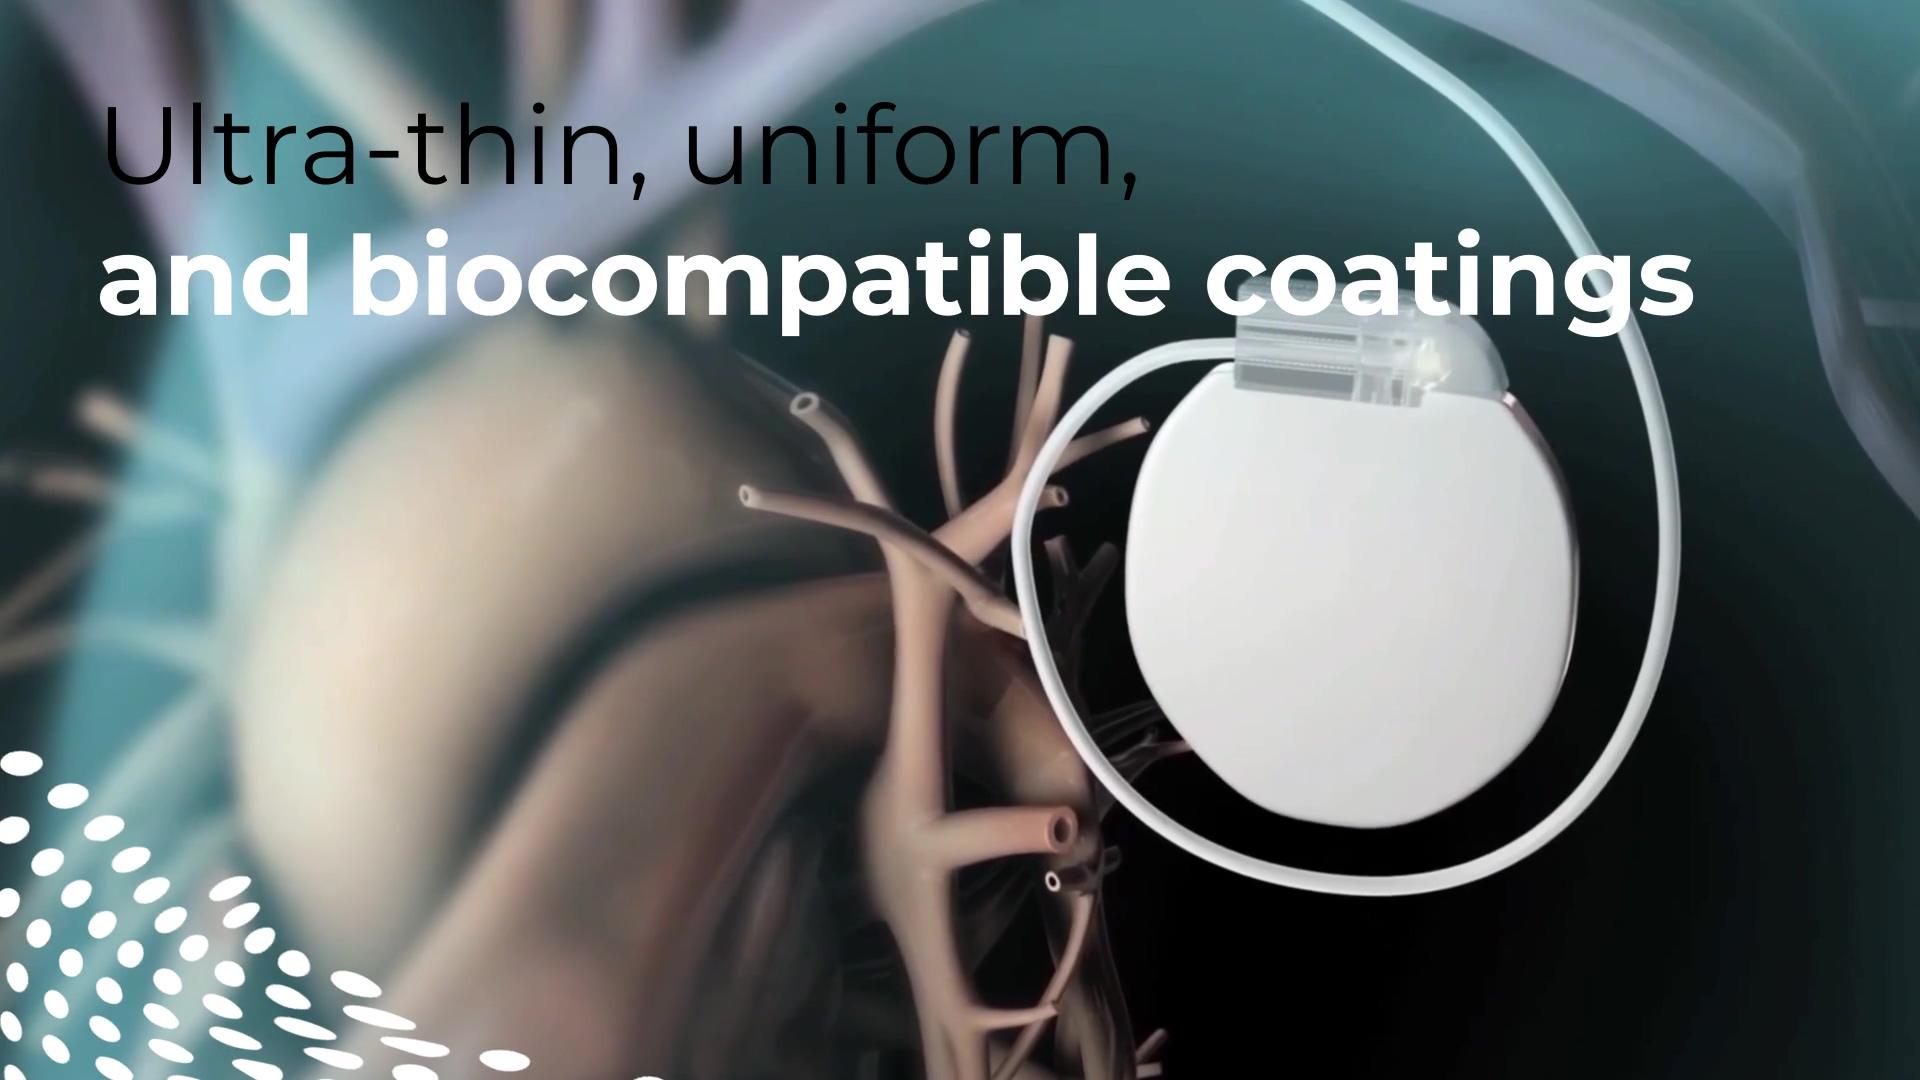 Picosun_Electric implants